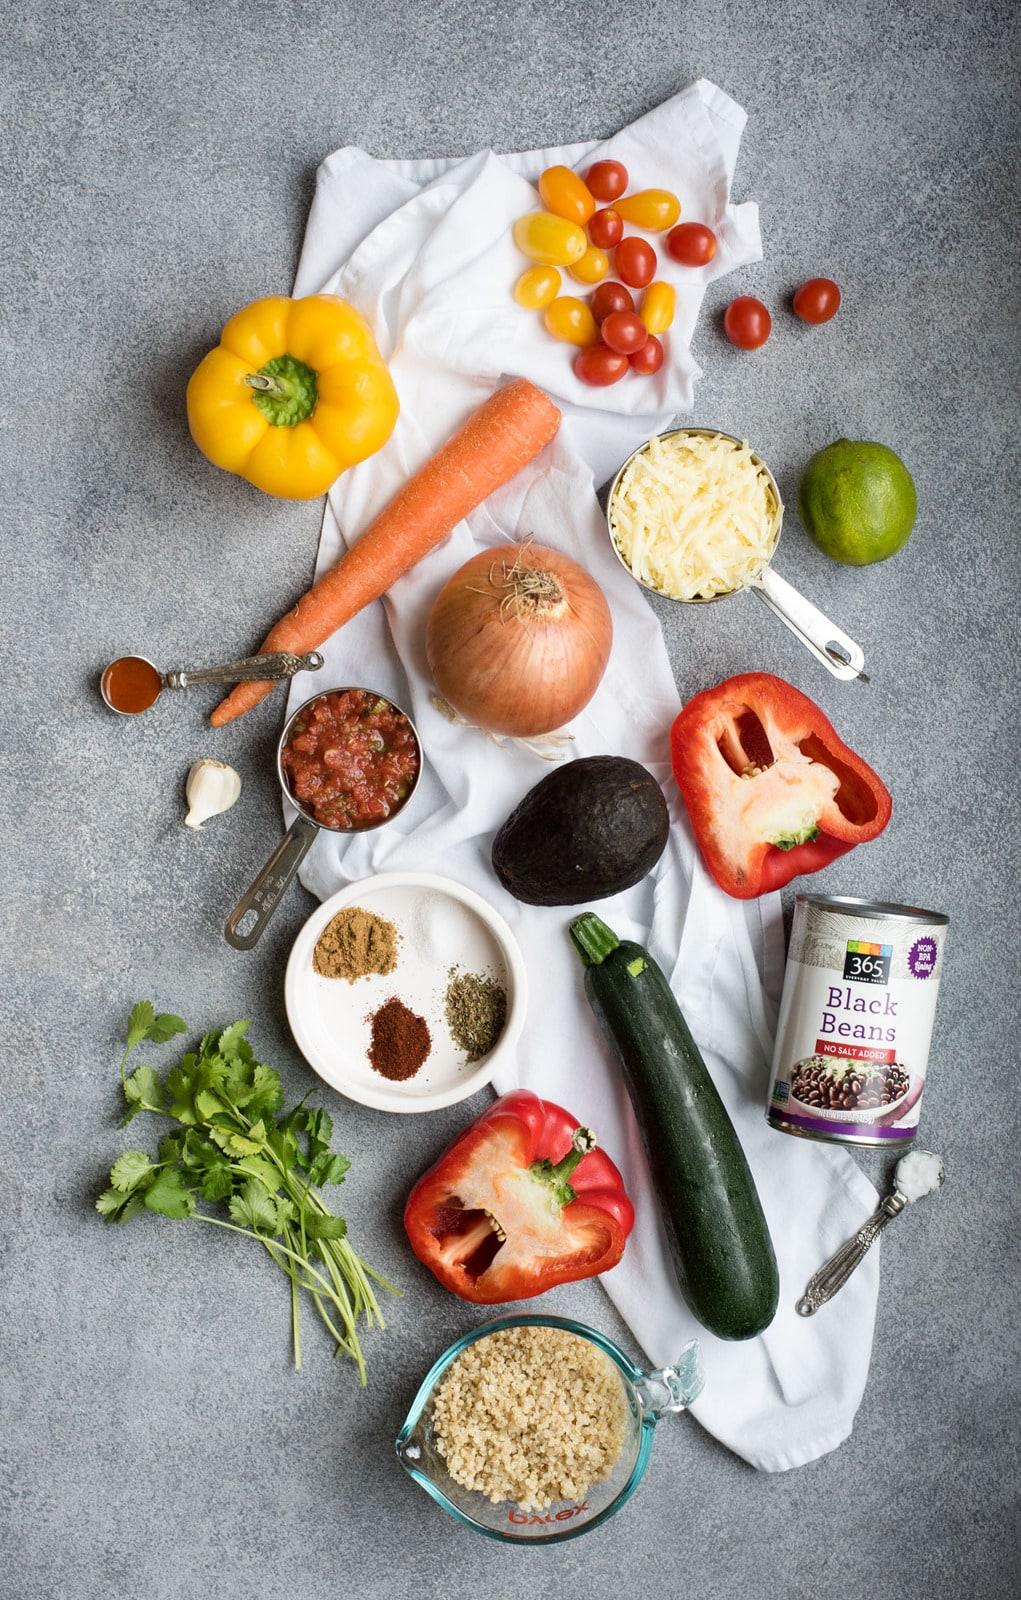 Black bean quinoa casserole raw ingredients